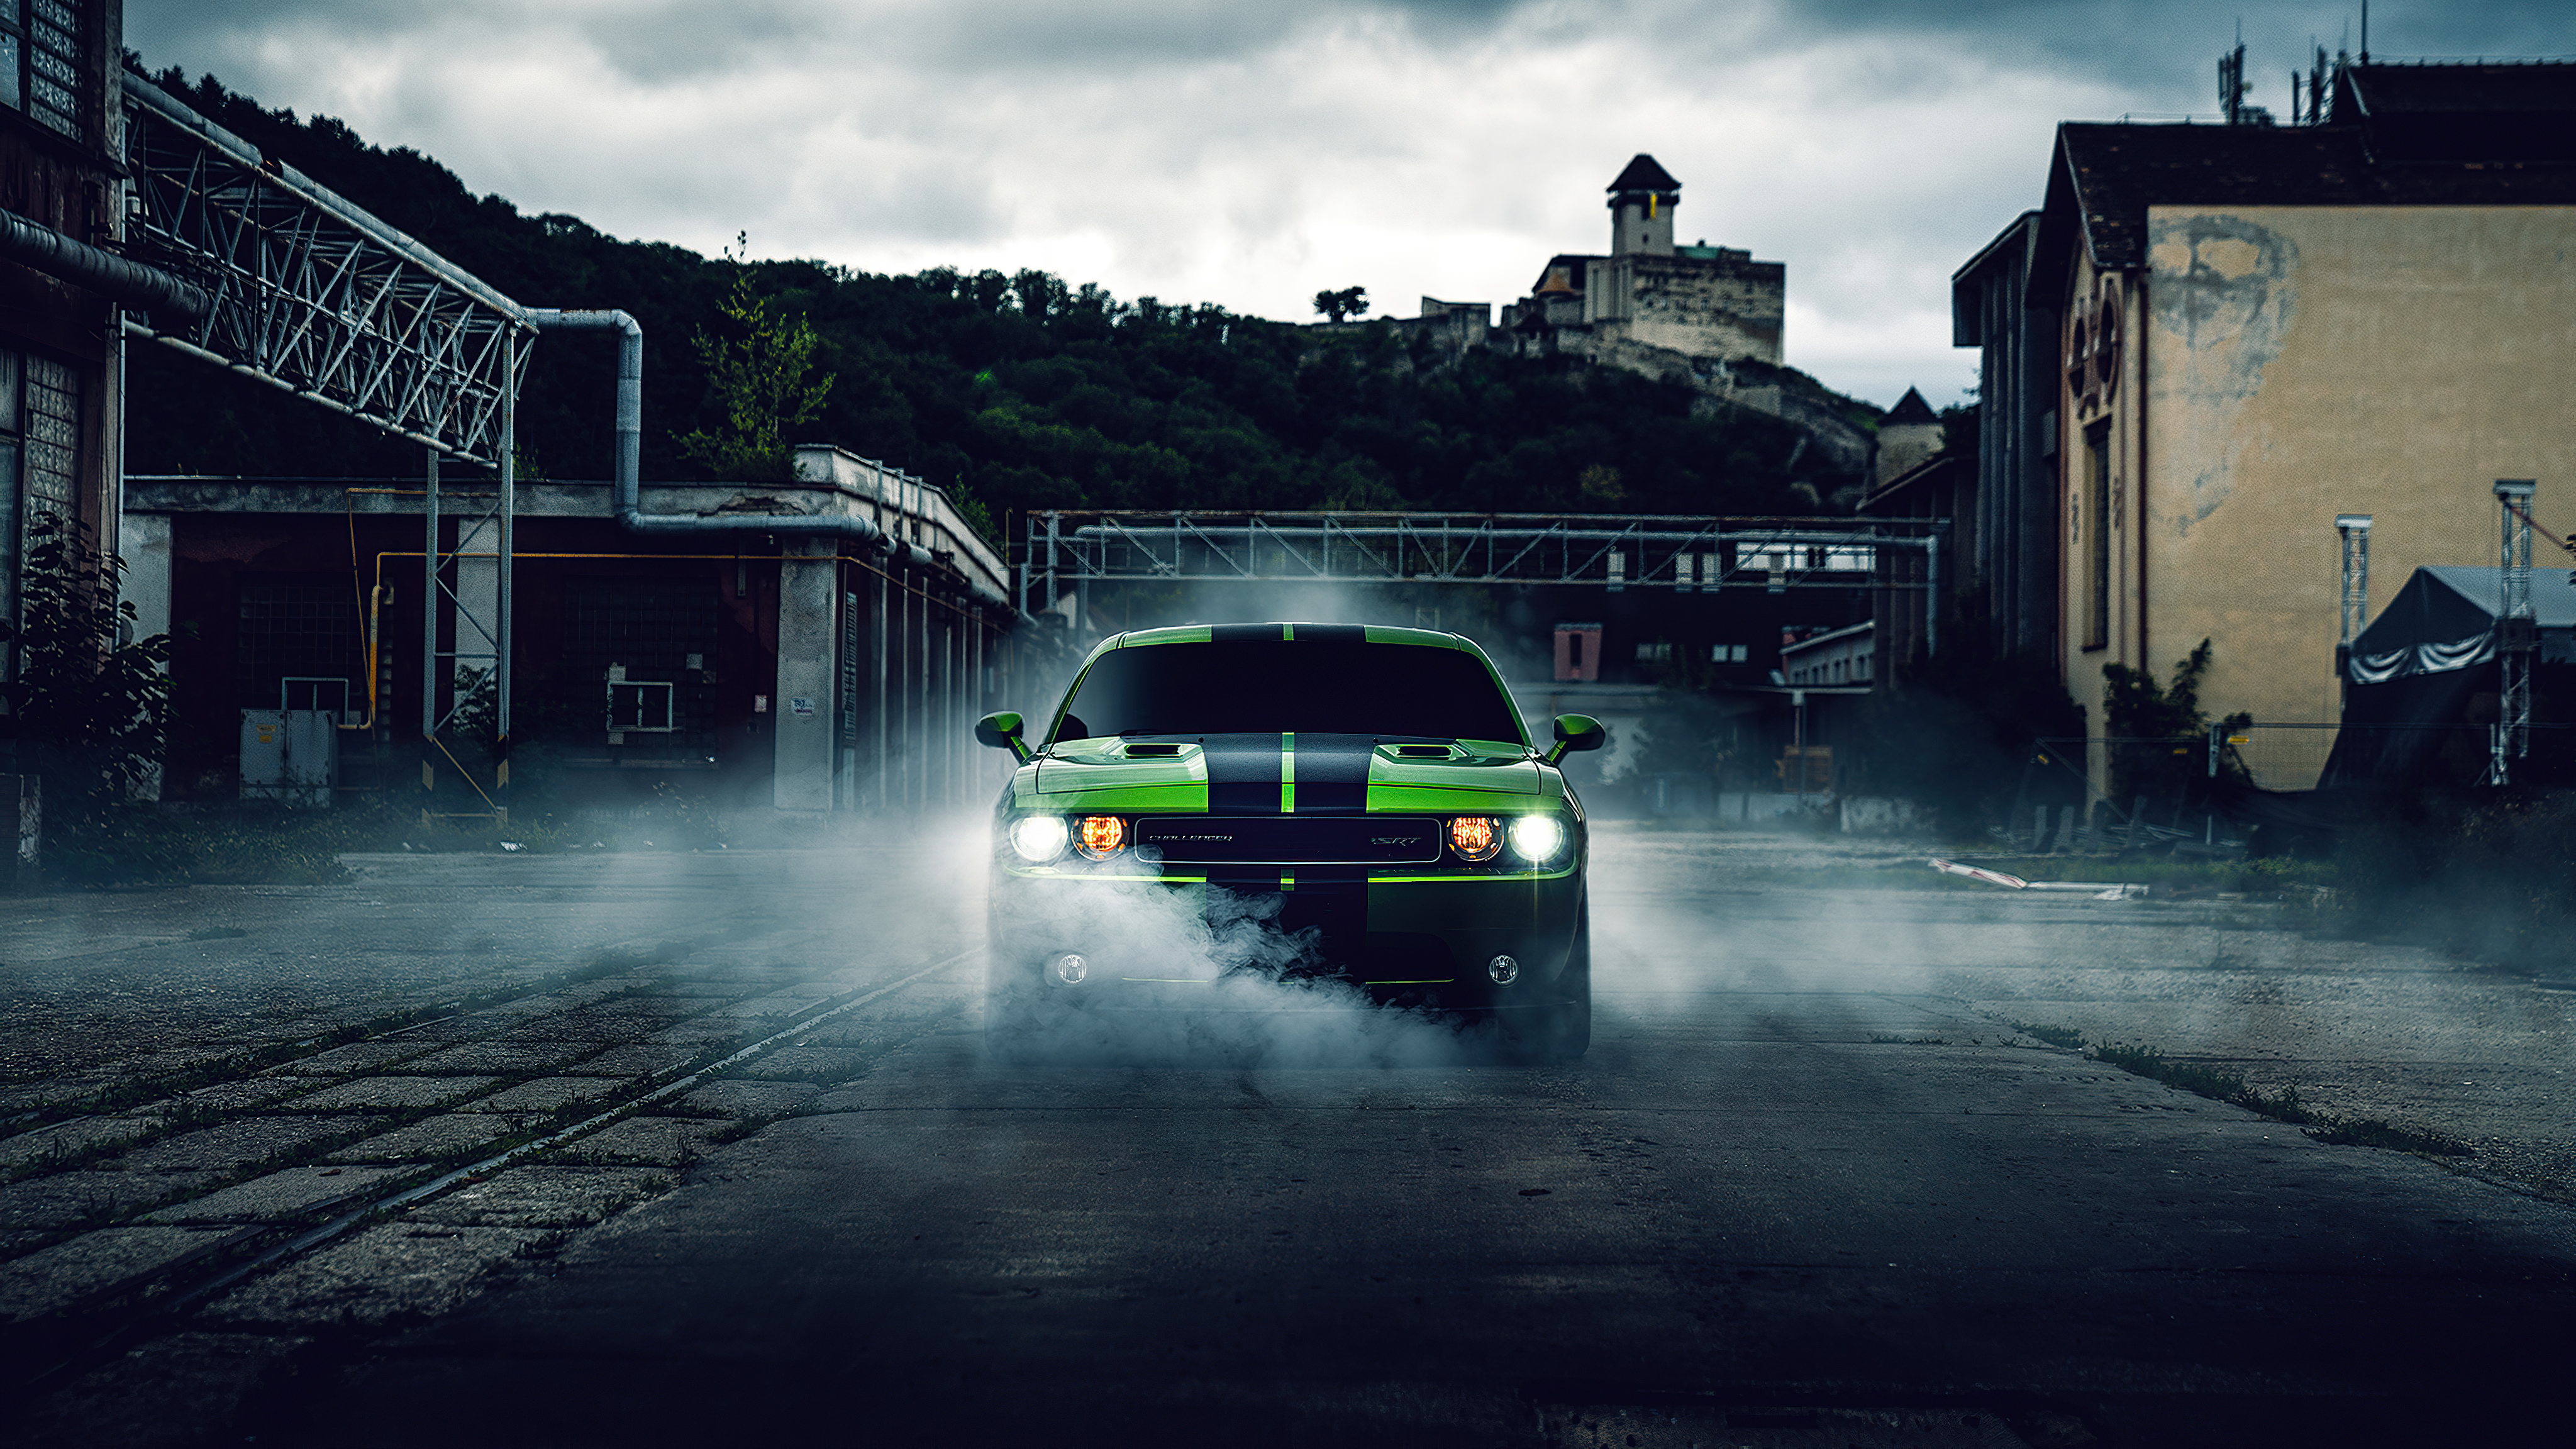 green dodge challenger 2020 4k 1608818823 - Green Dodge Challenger 2020 4k - Green Dodge Challenger 2020 4k wallpapers